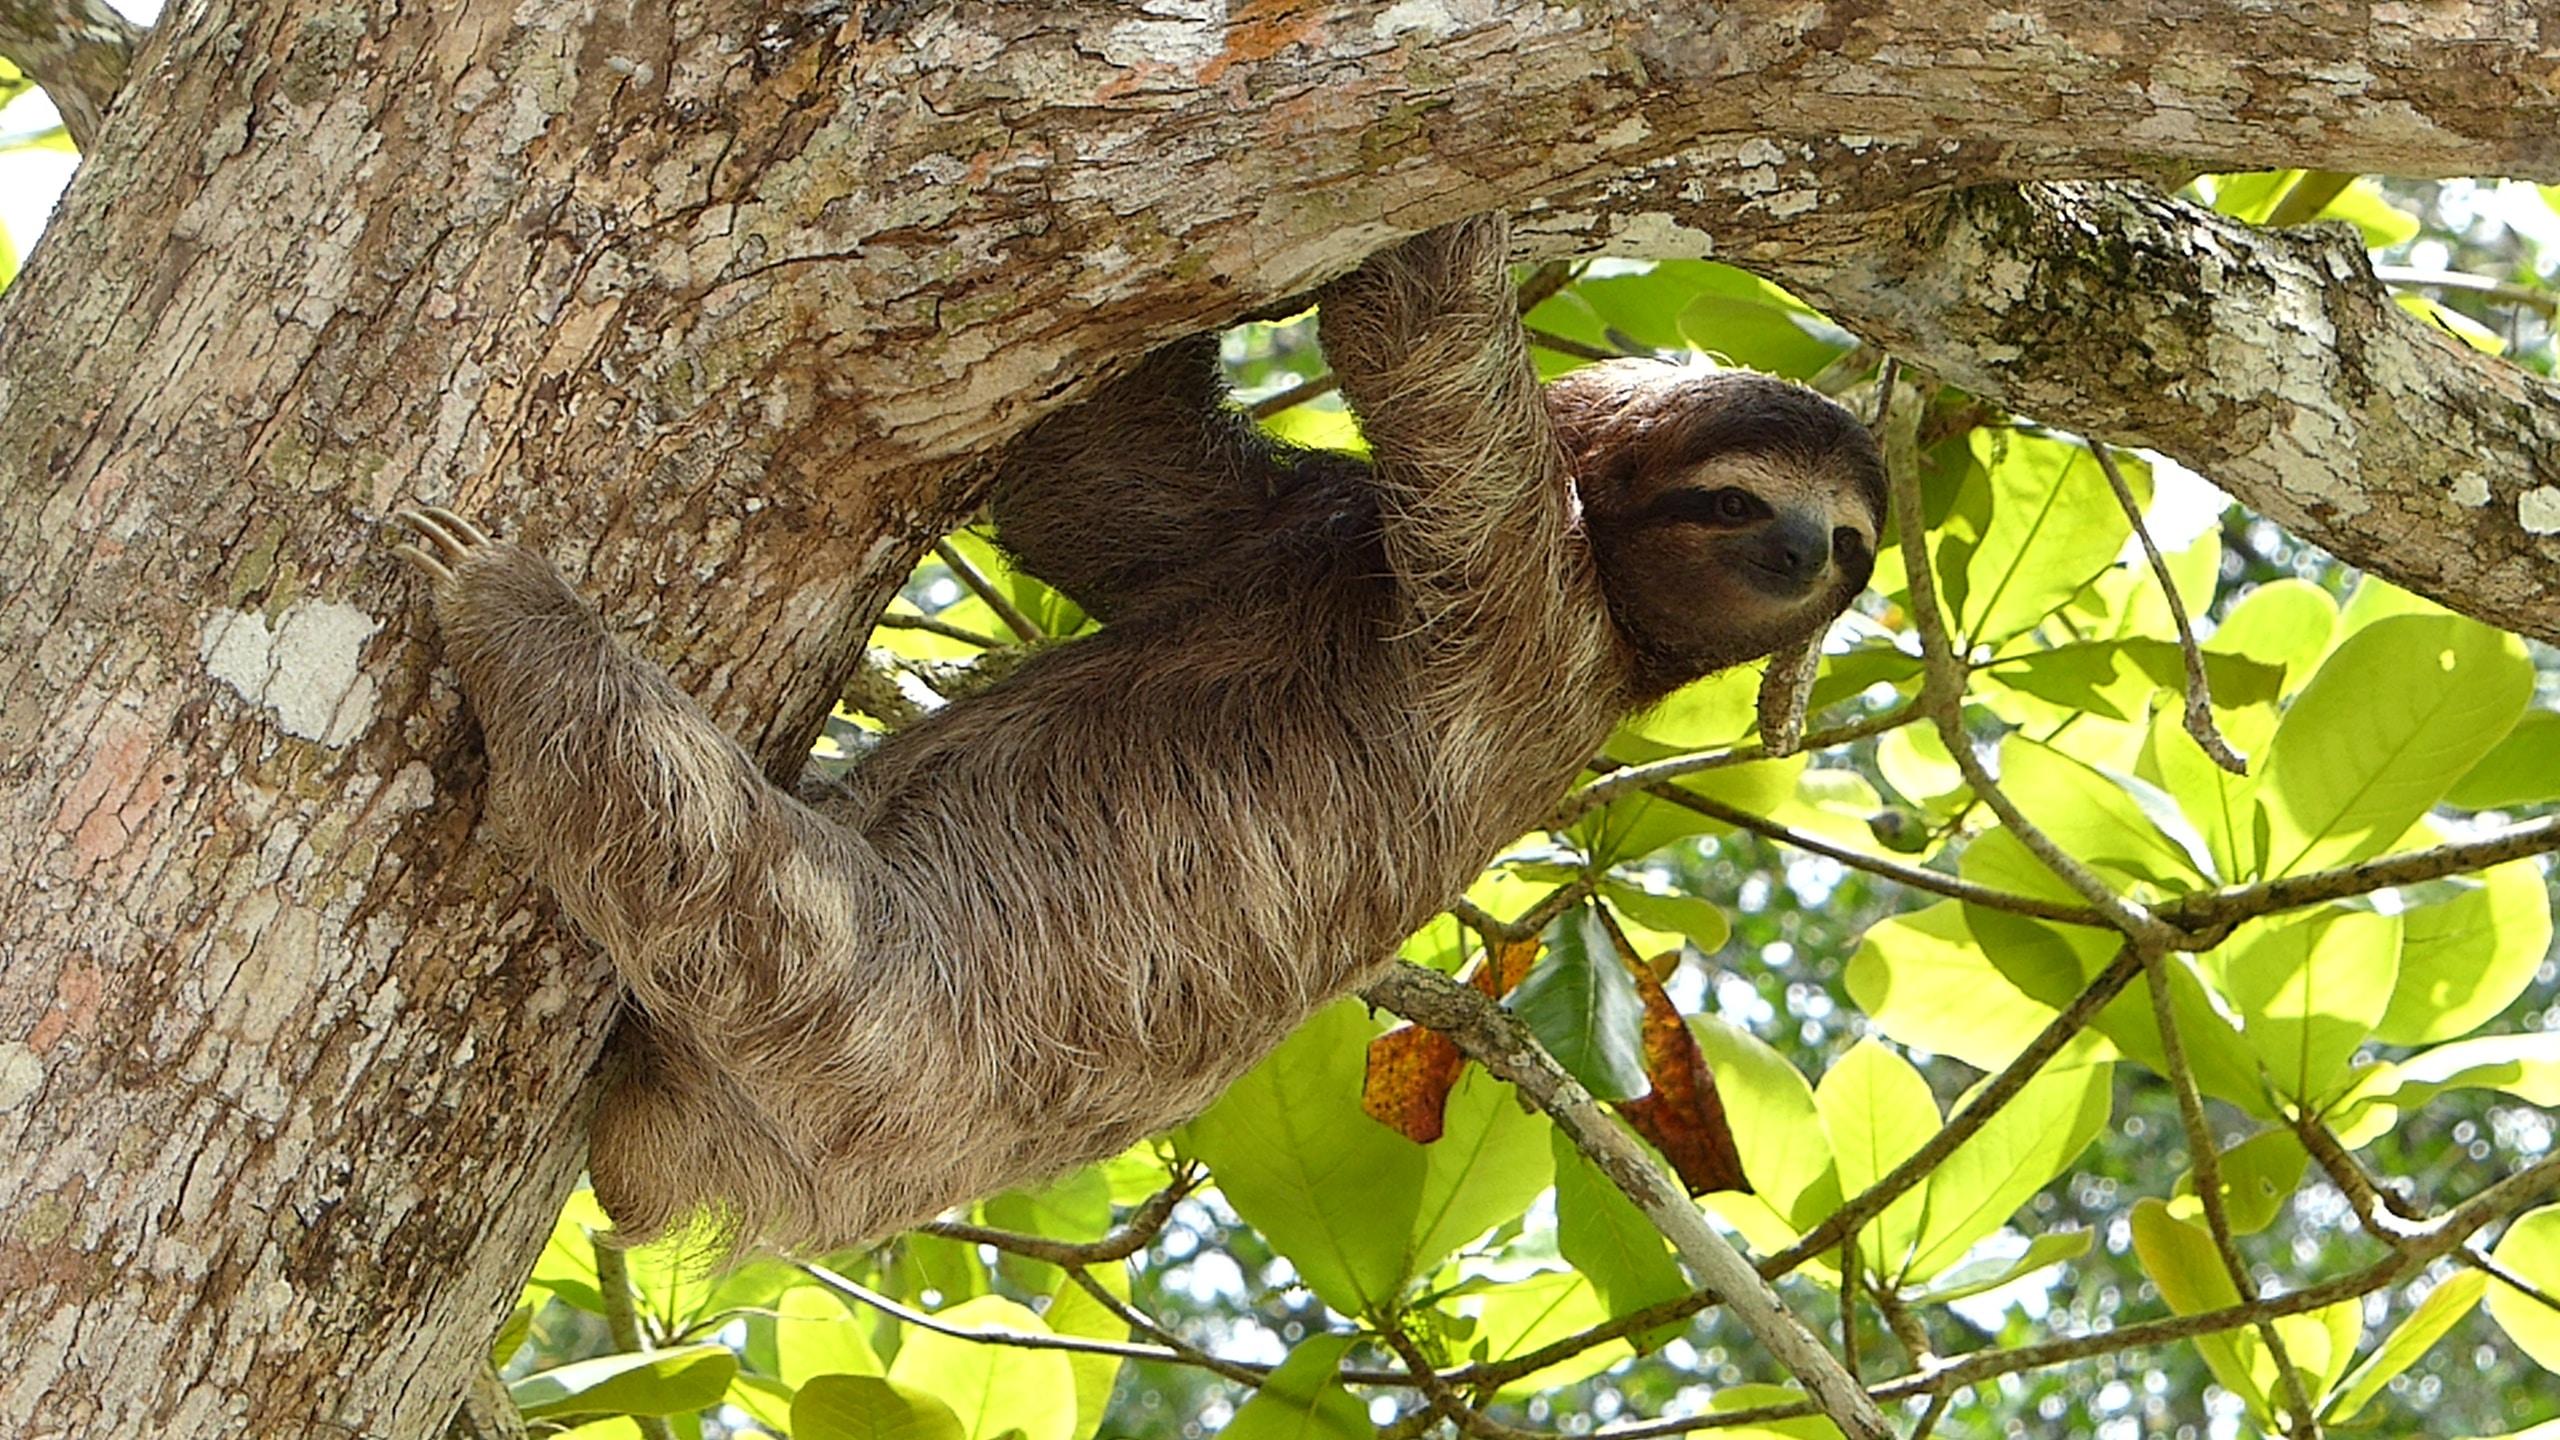 brown animal hanging on tree